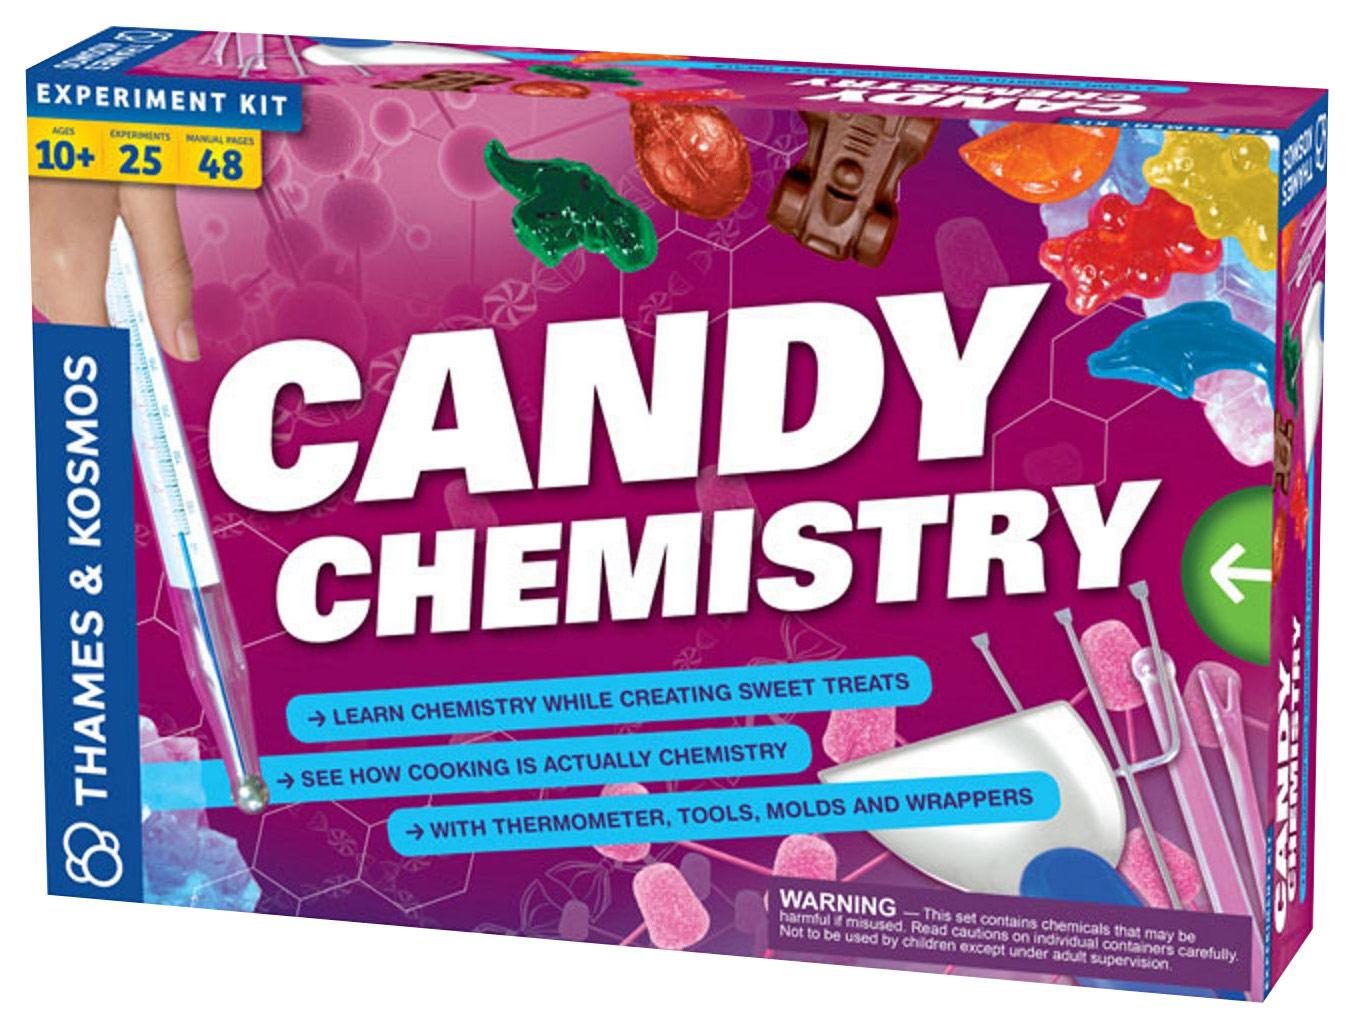 Thames & Kosmos - Candy Chemistry Kit - Multi 4670809